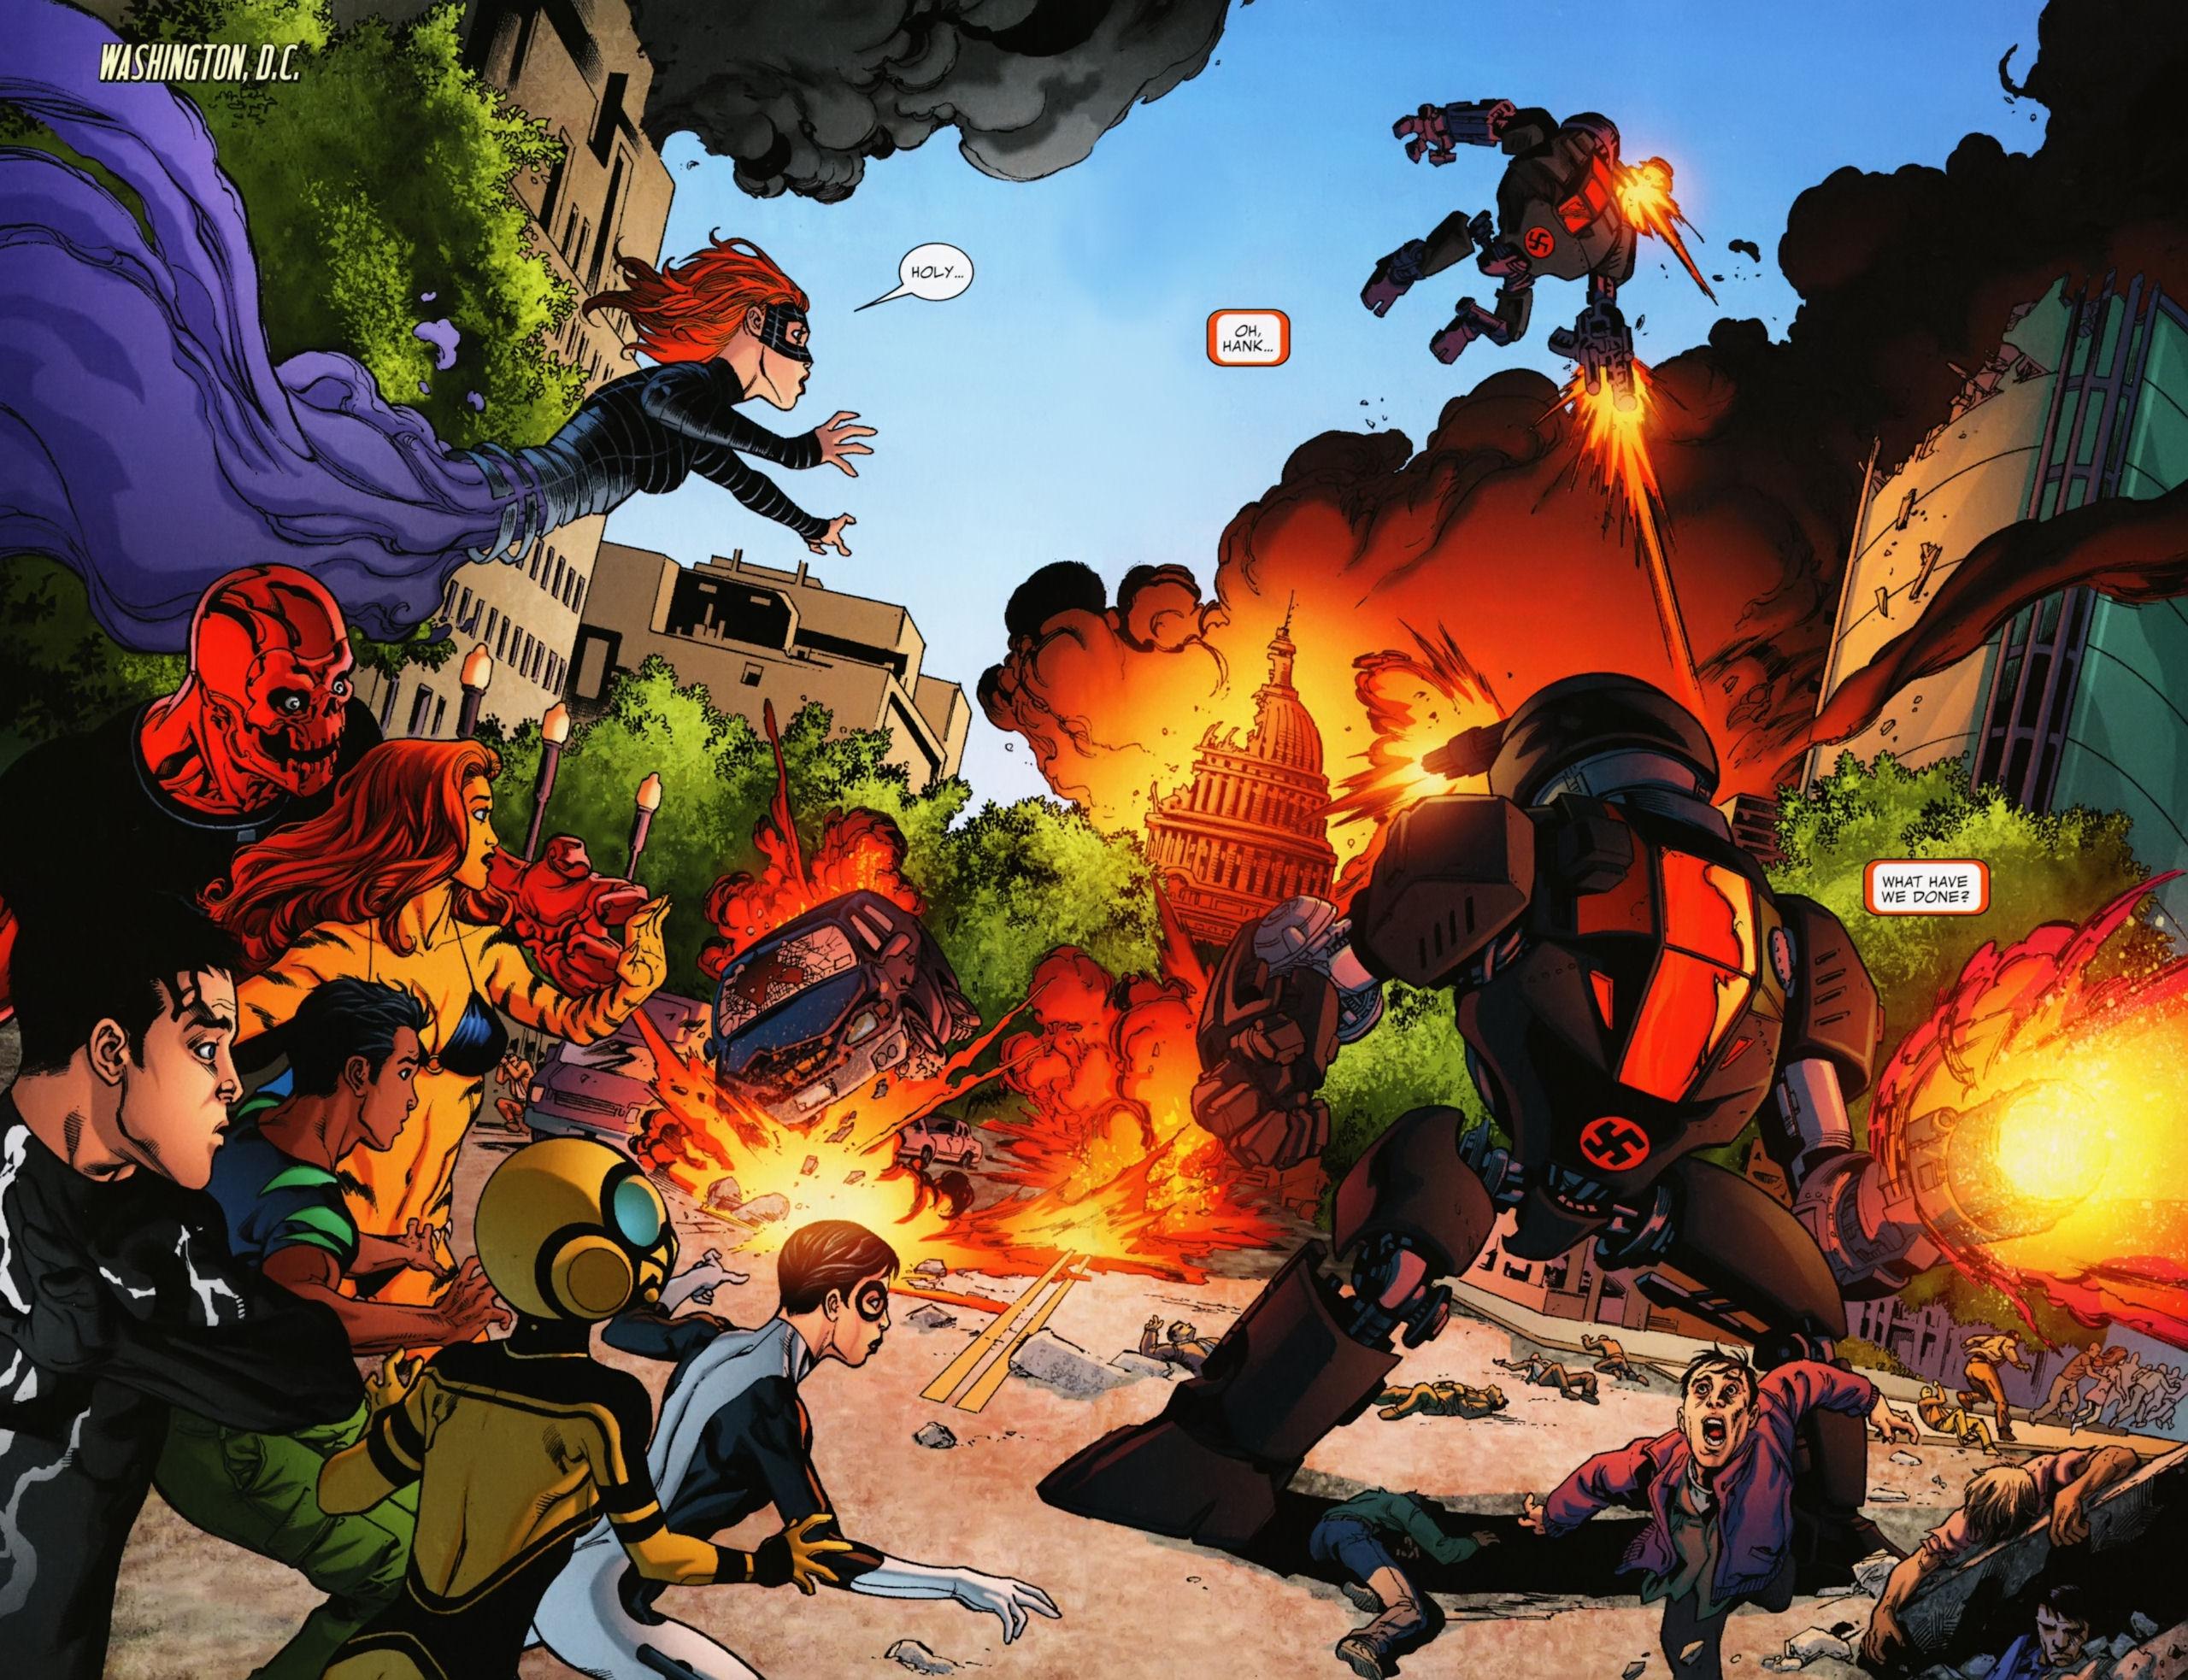 Avengers Academy Fear itself review